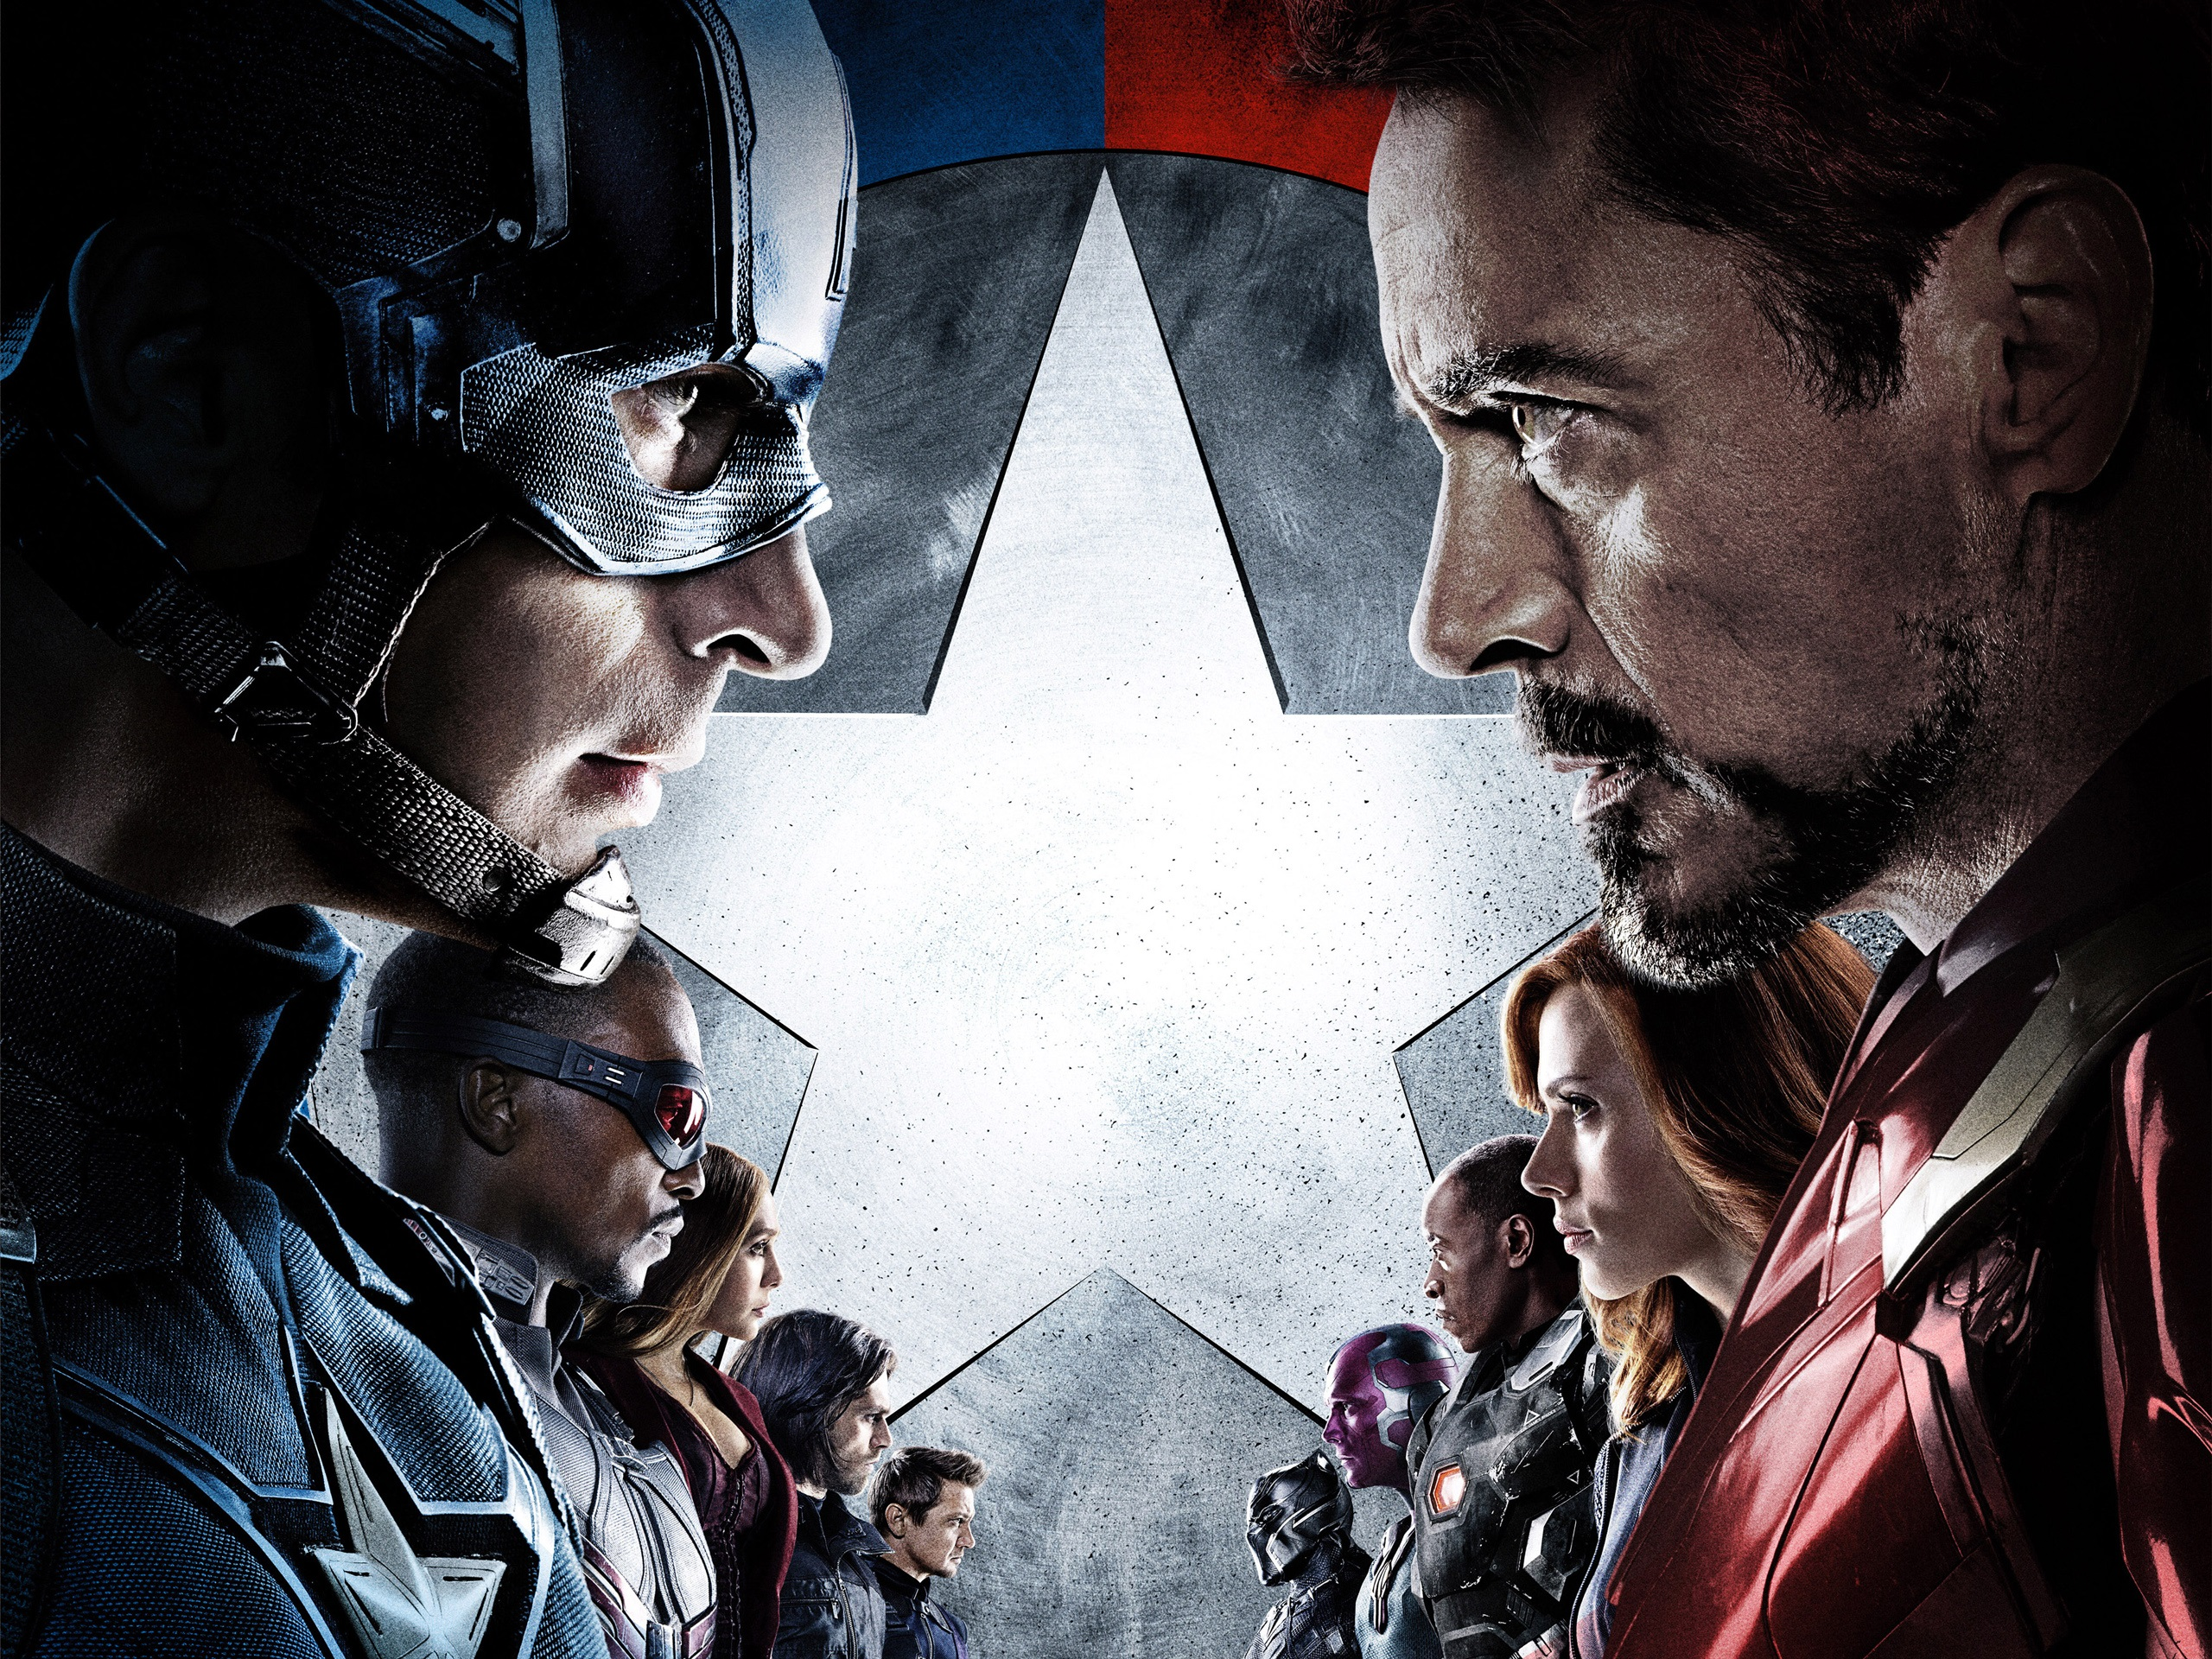 Amazoncom Marvels Captain America Civil War Bluray Chris Evans Robert Downey Jr Scarlett Johansson Sebastian Stan Anthony Mackie Don Cheadle Jeremy